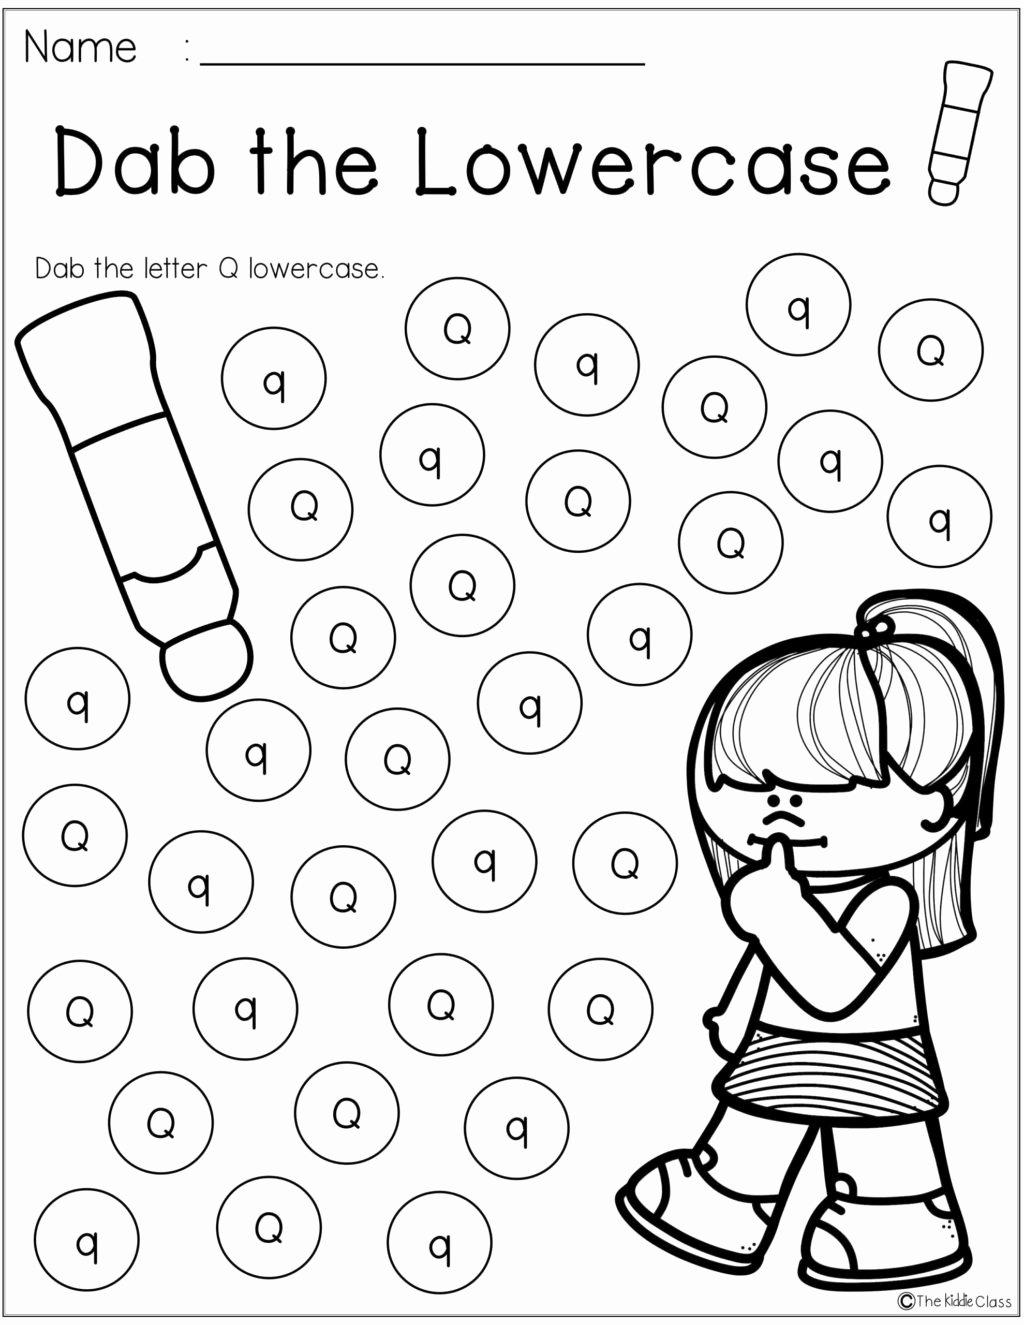 Literacy Worksheets for Preschoolers top Worksheet Letter Worksheets Printable 4th Grade Graphing